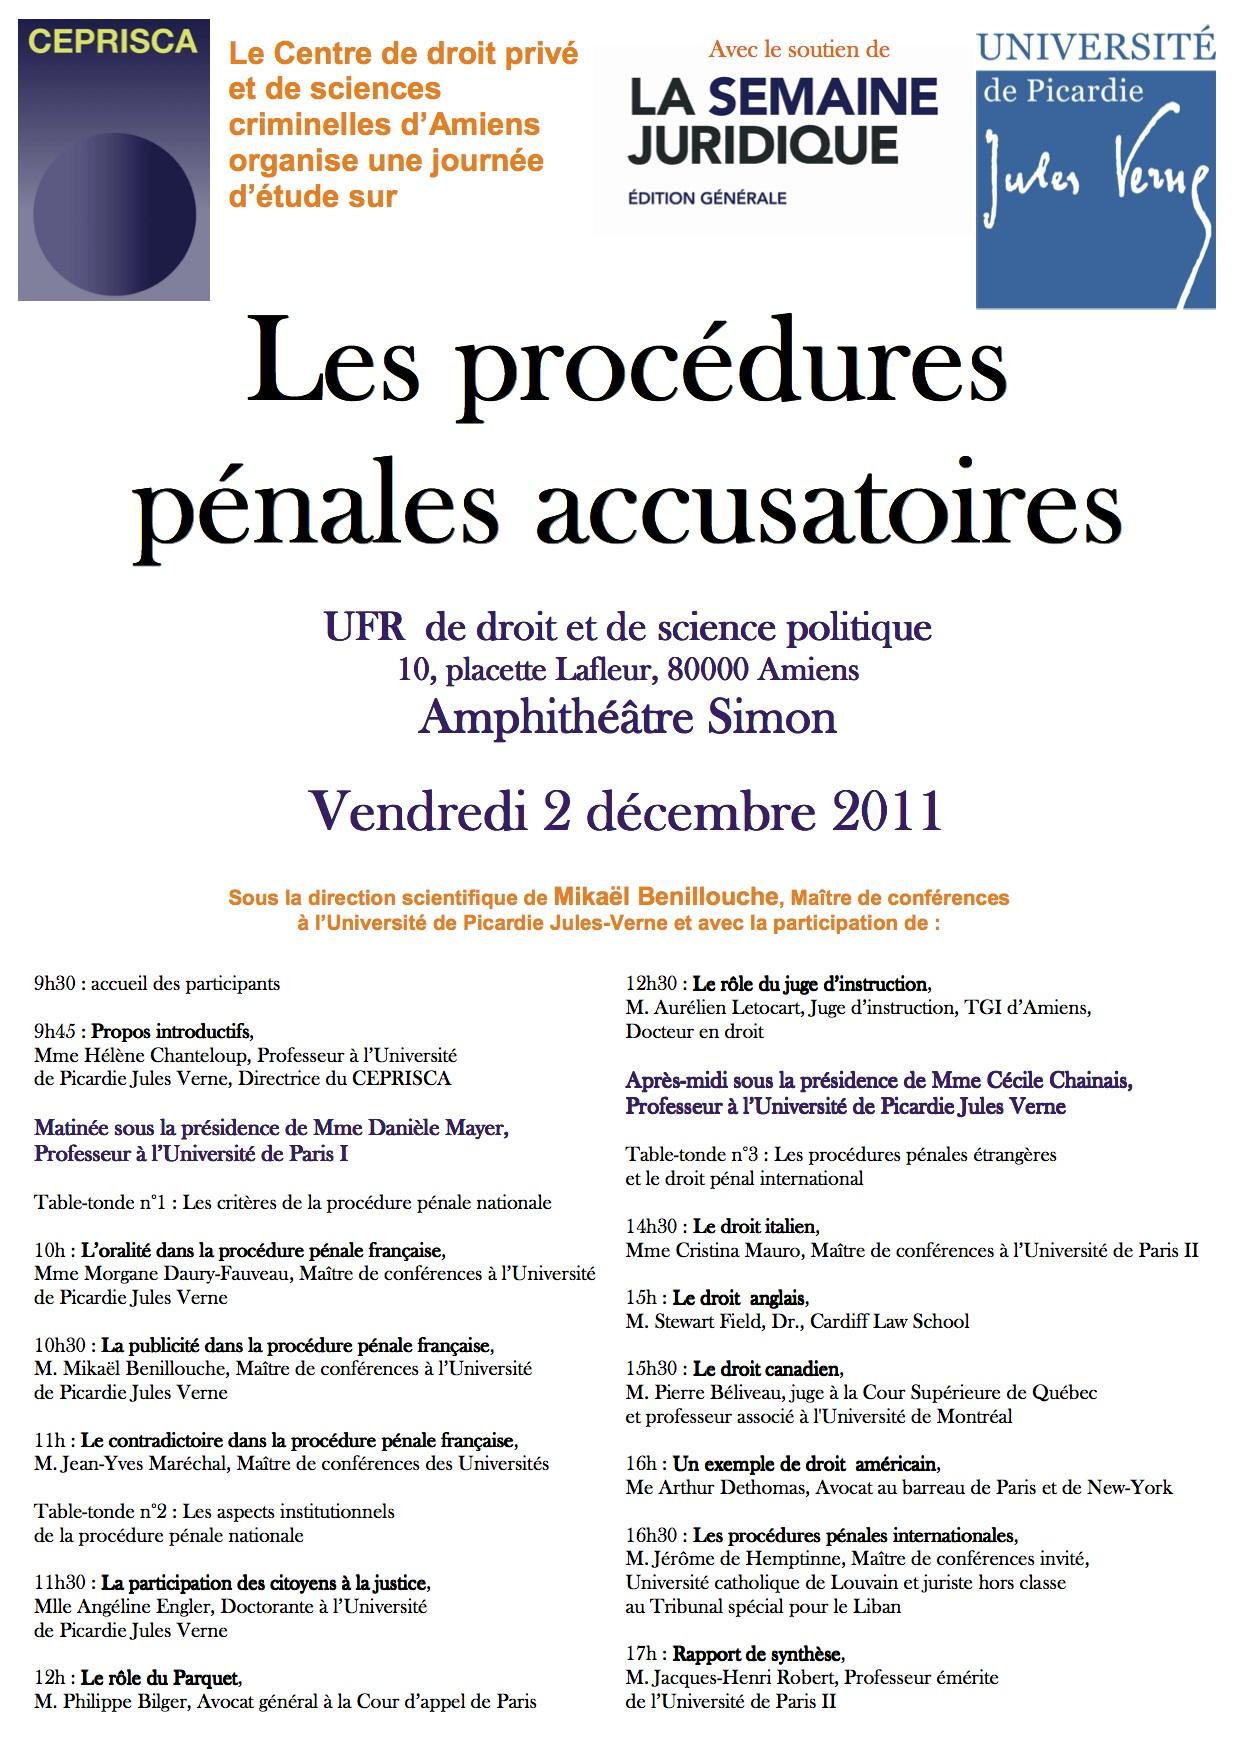 Affiche_CEPRISCA-_procedures_penales_accusatoires_-_2-12-2011